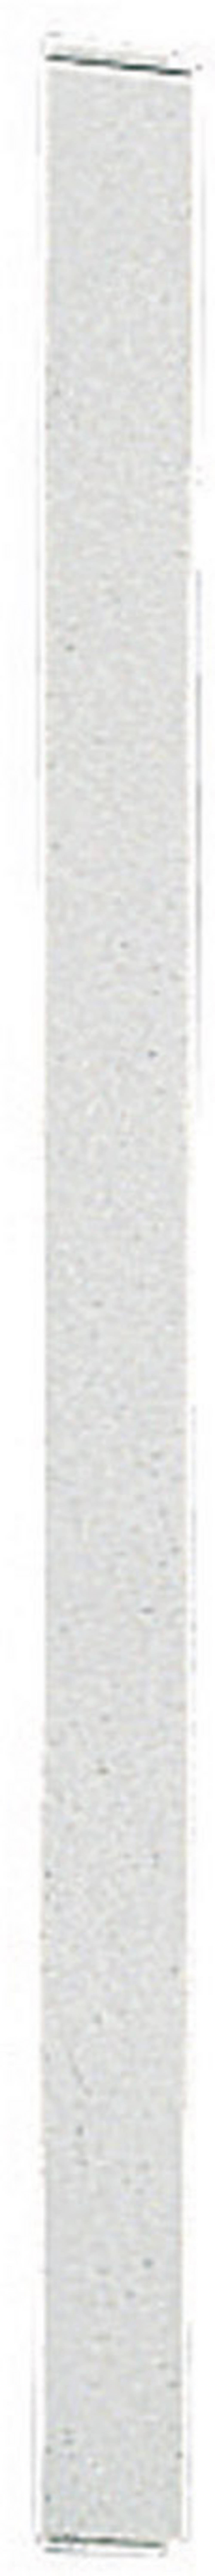 OKW Abdeckstreifen für DATEC-TERMINAL B4113677 ABS sivo-bijeli